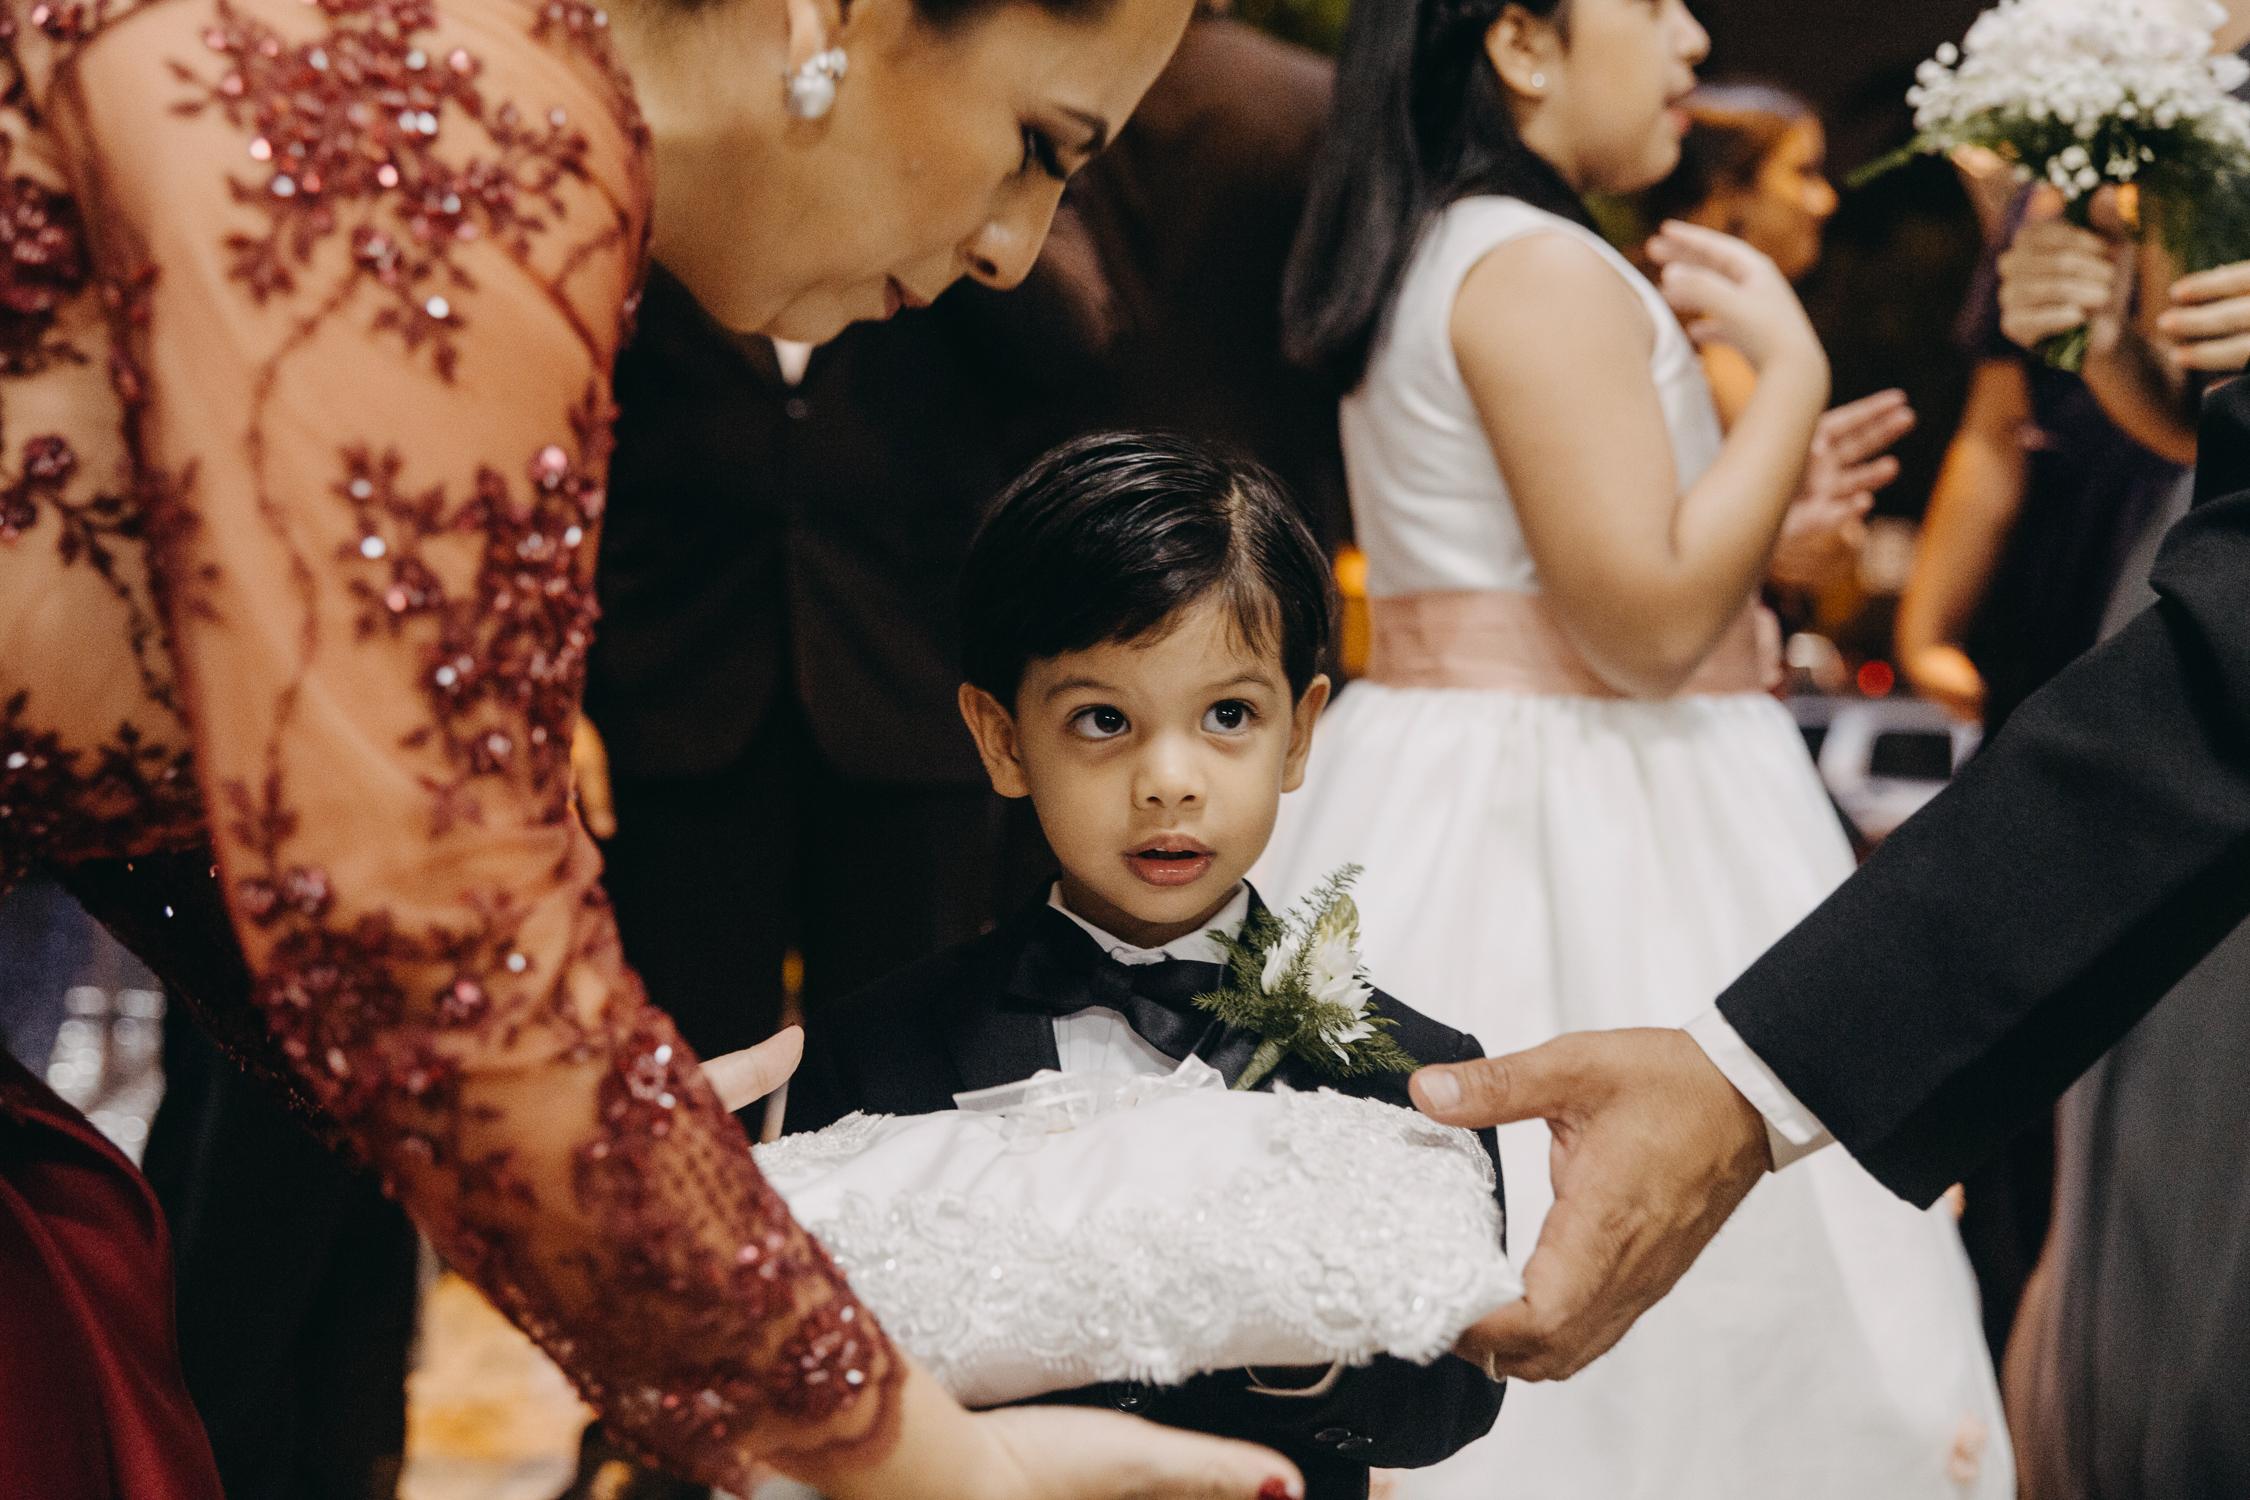 Michelle-Agurto-Fotografia-Bodas-Ecuador-Destination-Wedding-Photographer-Vicky-Javier-40.JPG